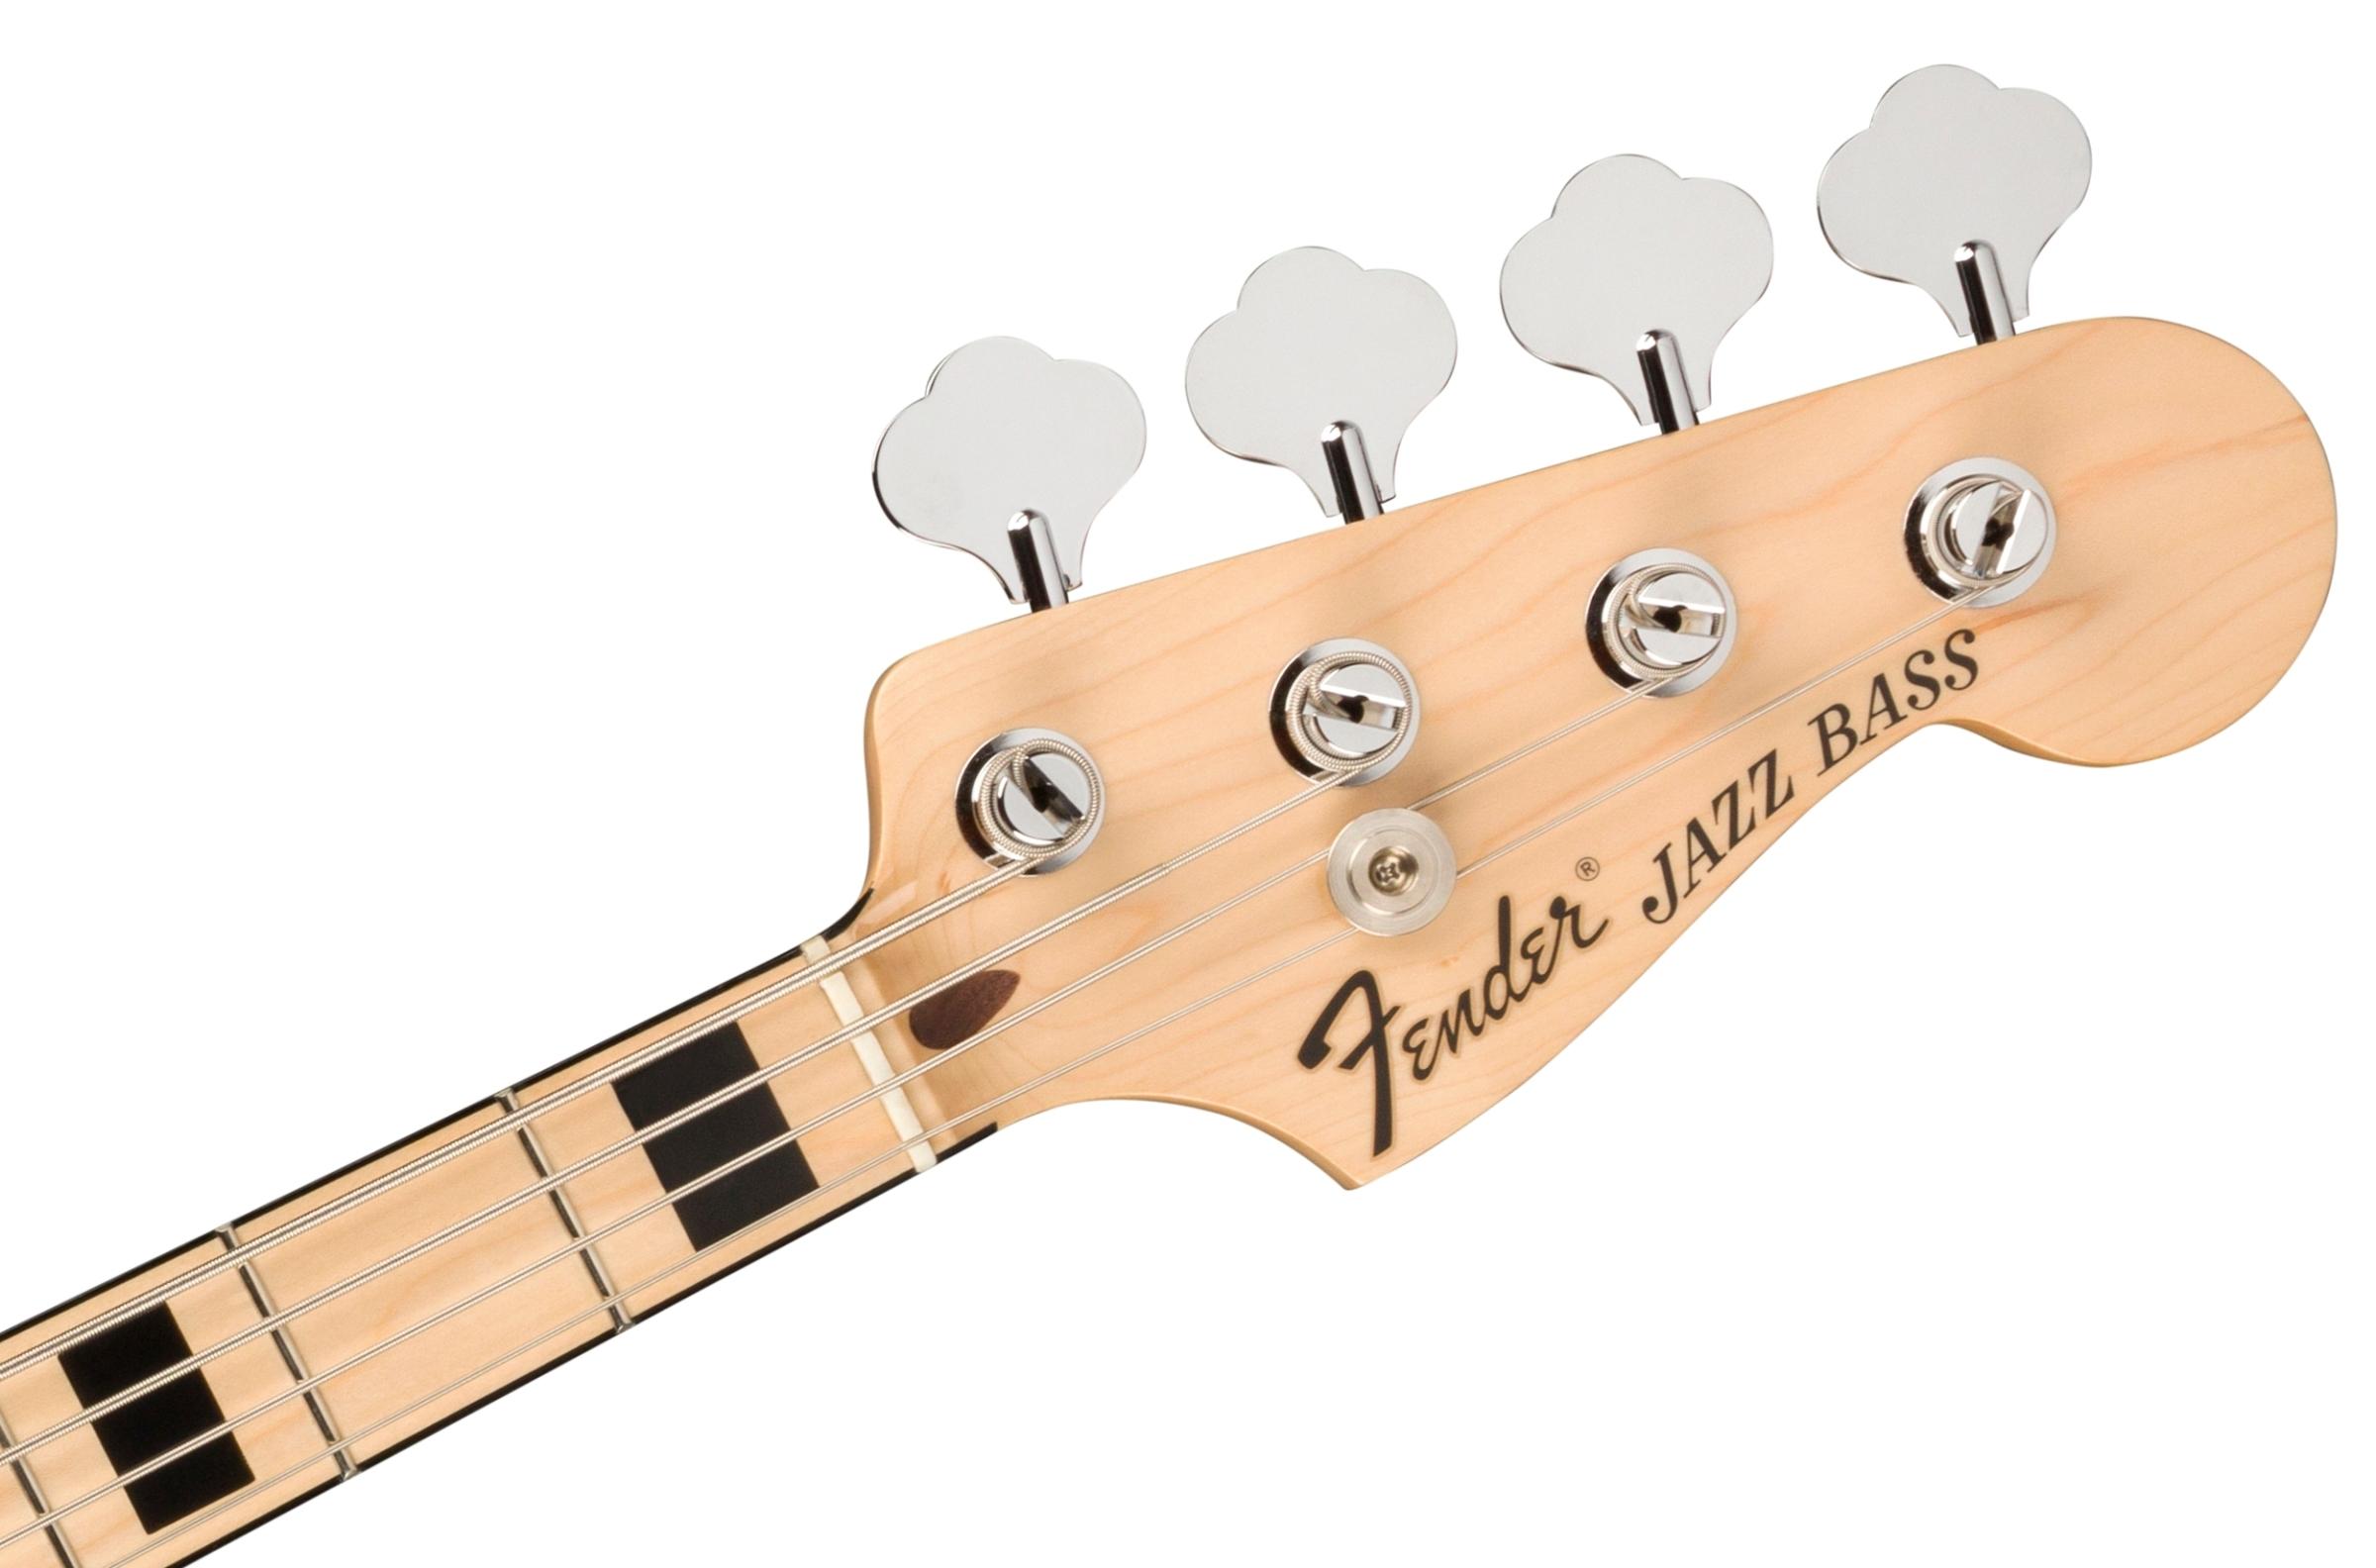 geddy lee jazz bass fender bass guitars. Black Bedroom Furniture Sets. Home Design Ideas